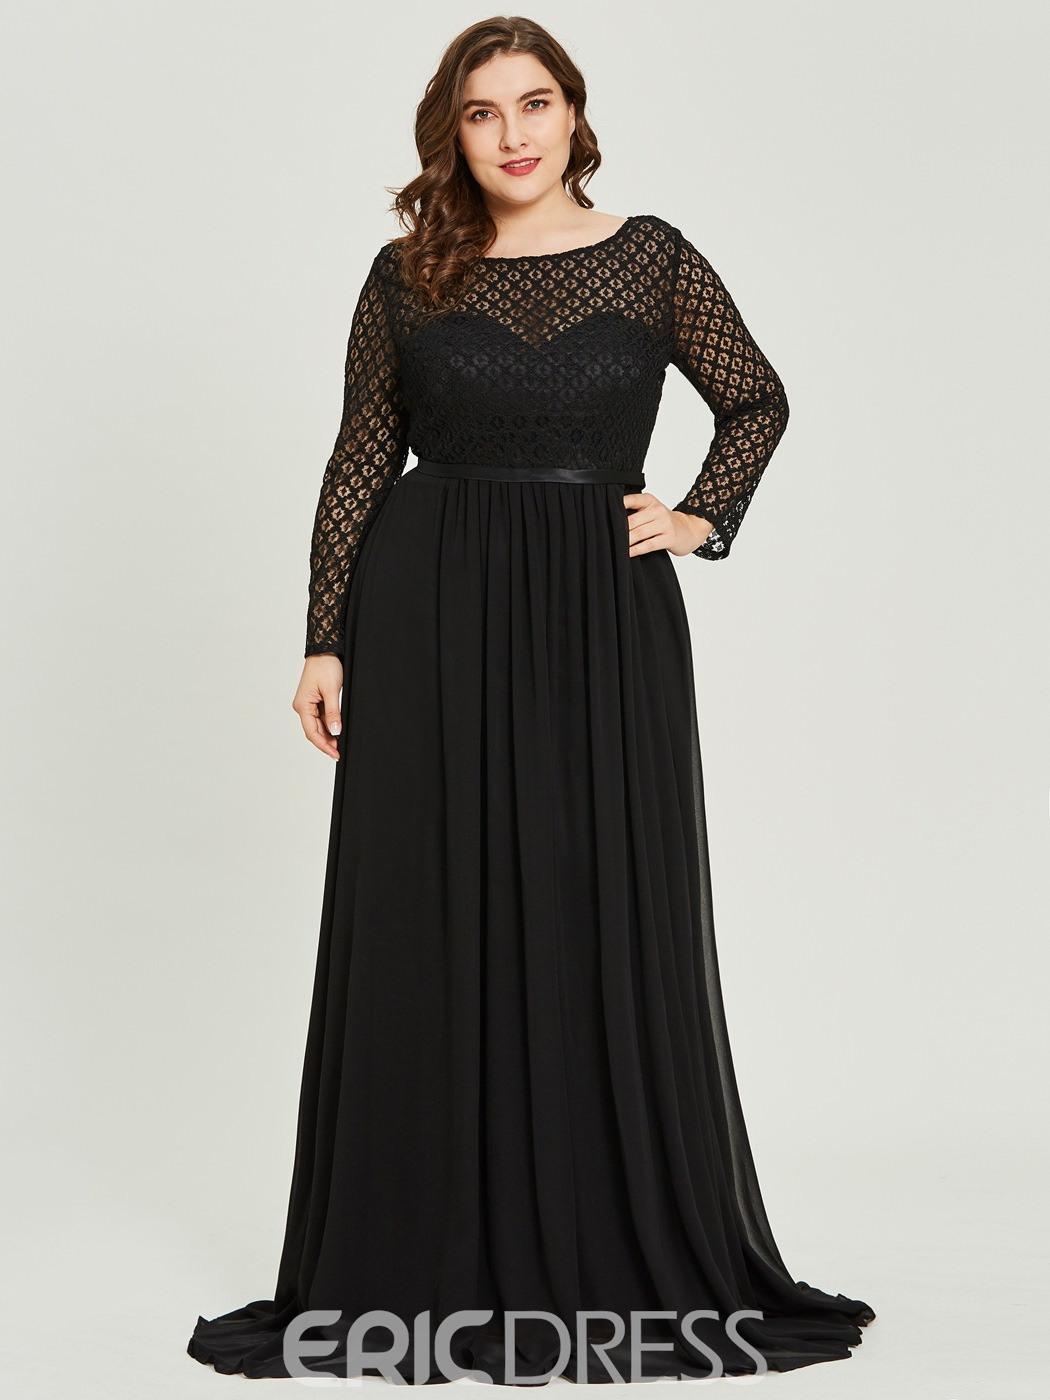 20 Leicht Abendkleid U Ausschnitt Spezialgebiet10 Spektakulär Abendkleid U Ausschnitt Vertrieb